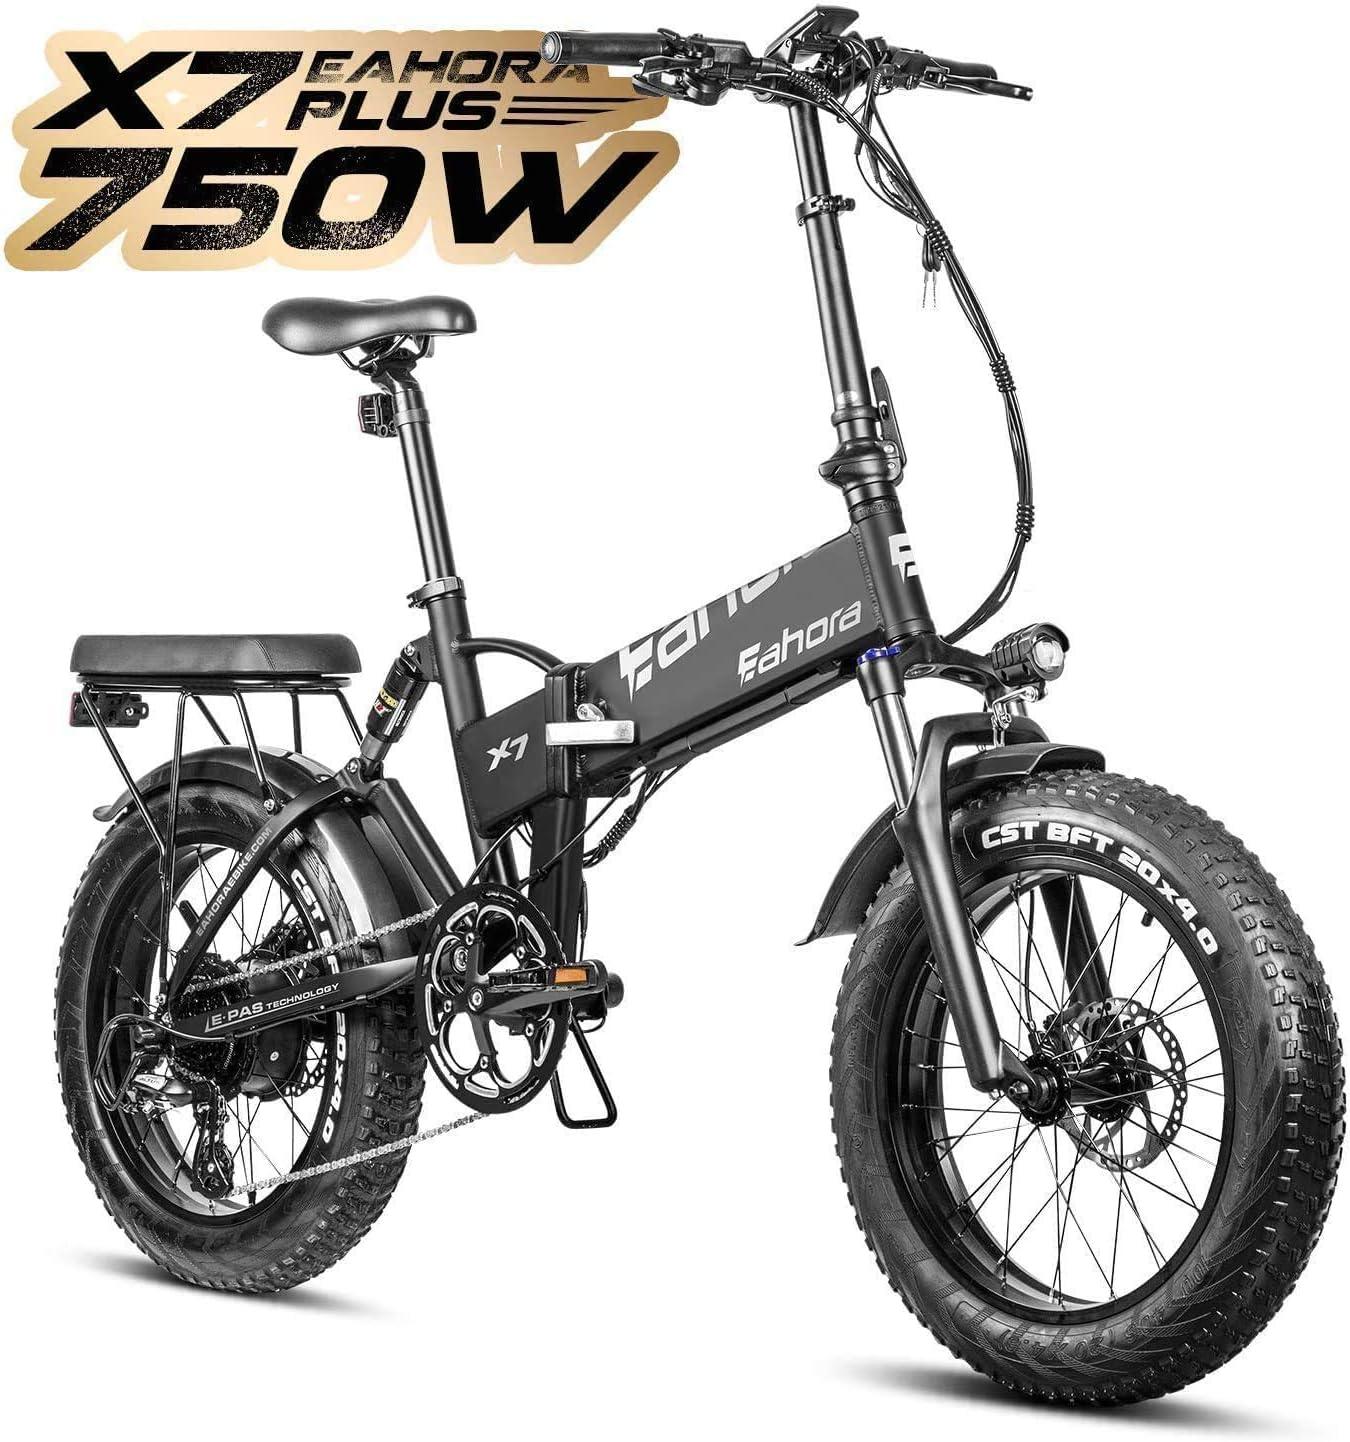 Eahora X7 Plus 750W 4.0 Fat Tire Folding Electric Bicycle